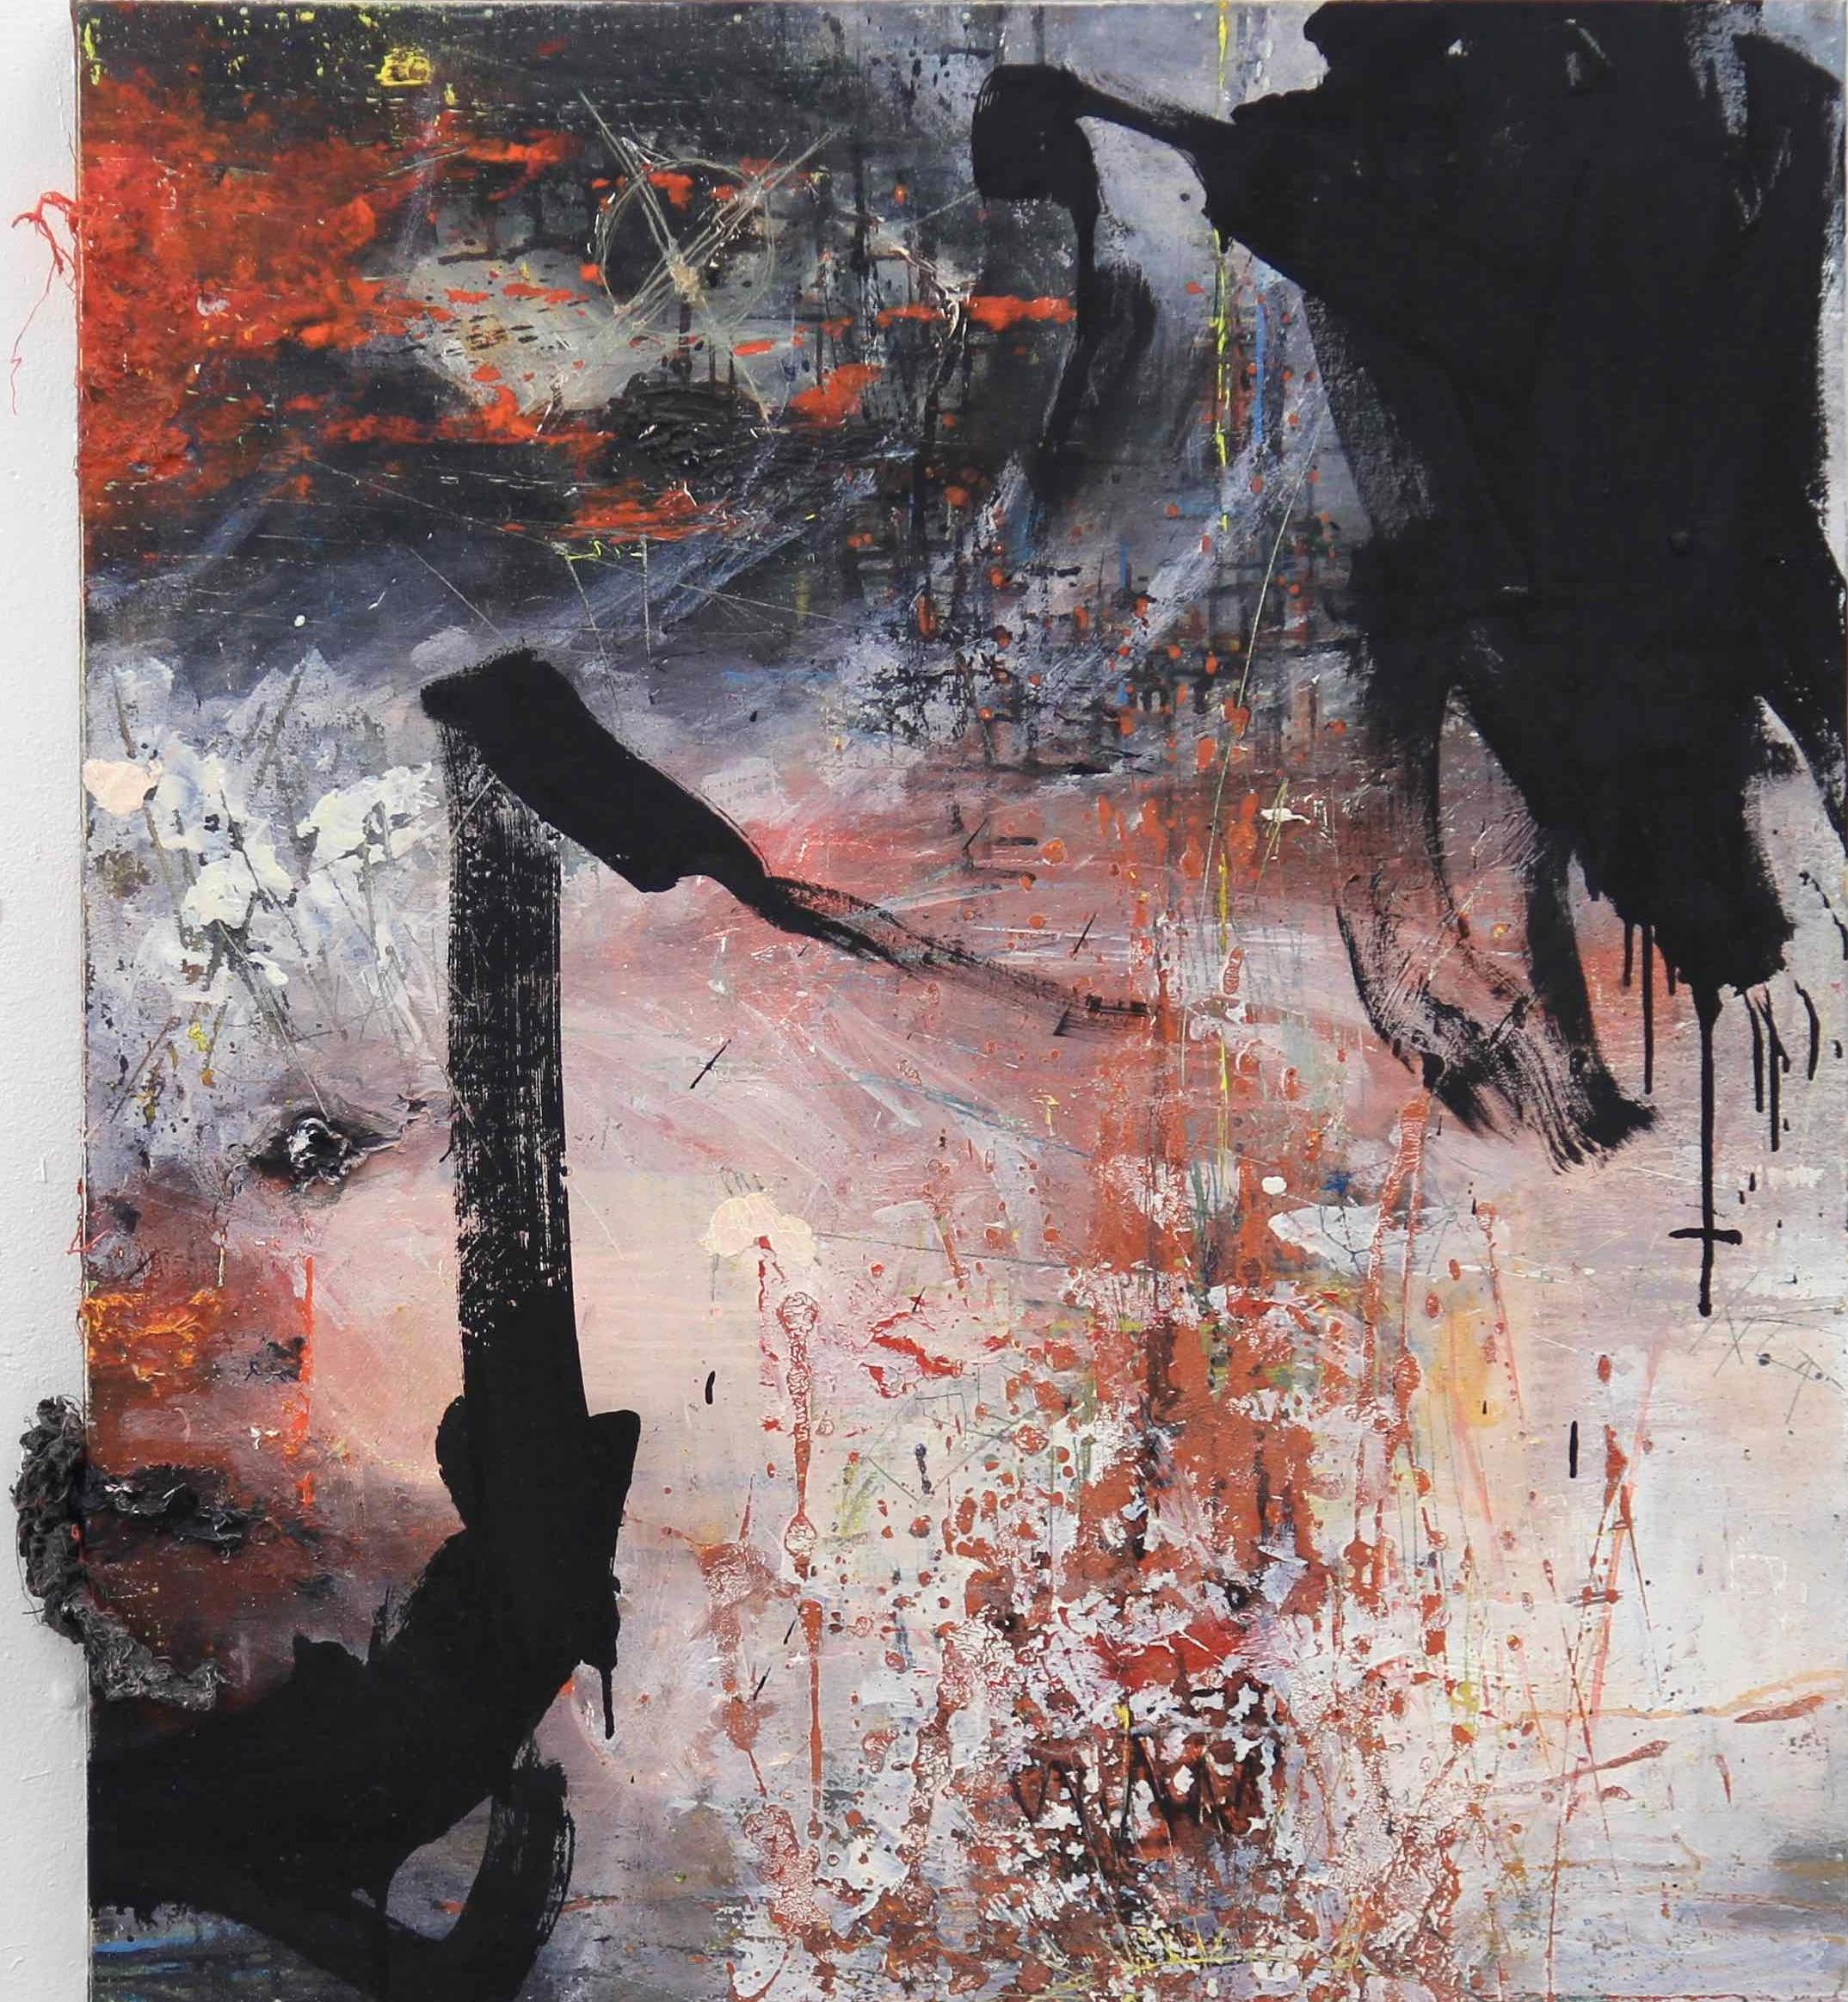 Early mo(u)rning / 2012 / acrylic, oil, thread on panel / 35.43 x 31.5 inches / 90 x 80 cm